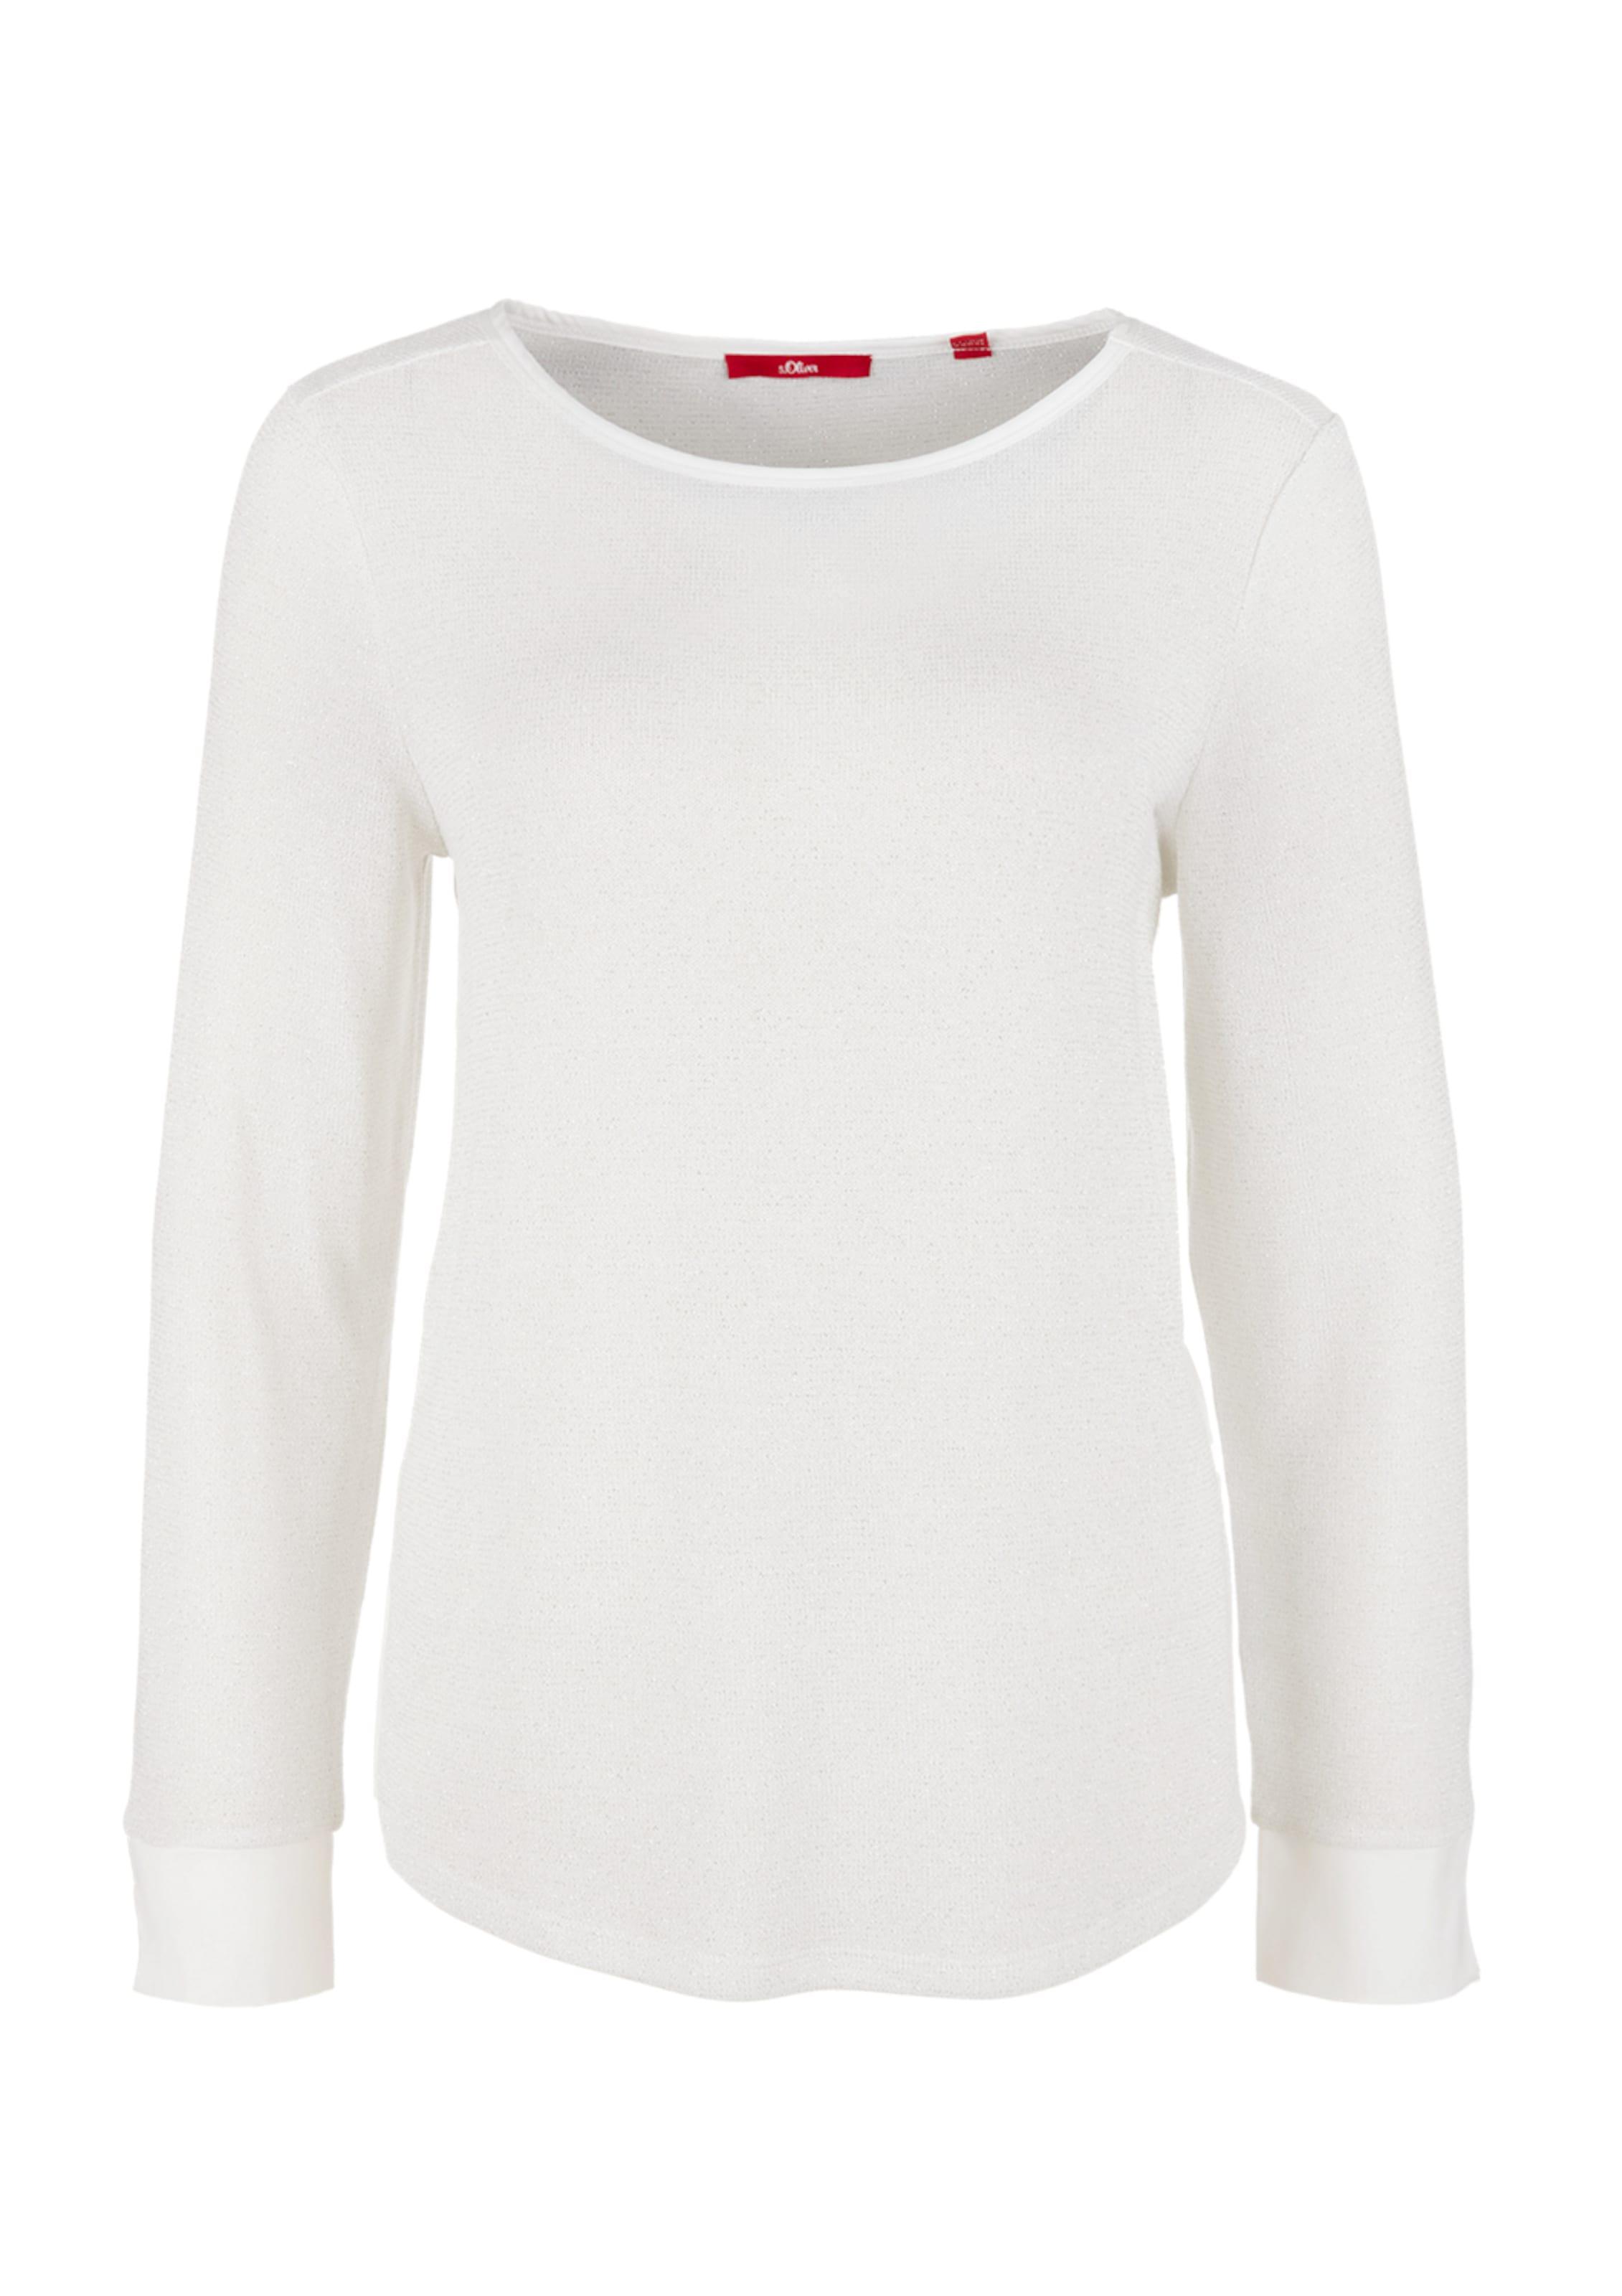 Red In Shirt oliver Label Weiß S bgYf76yv